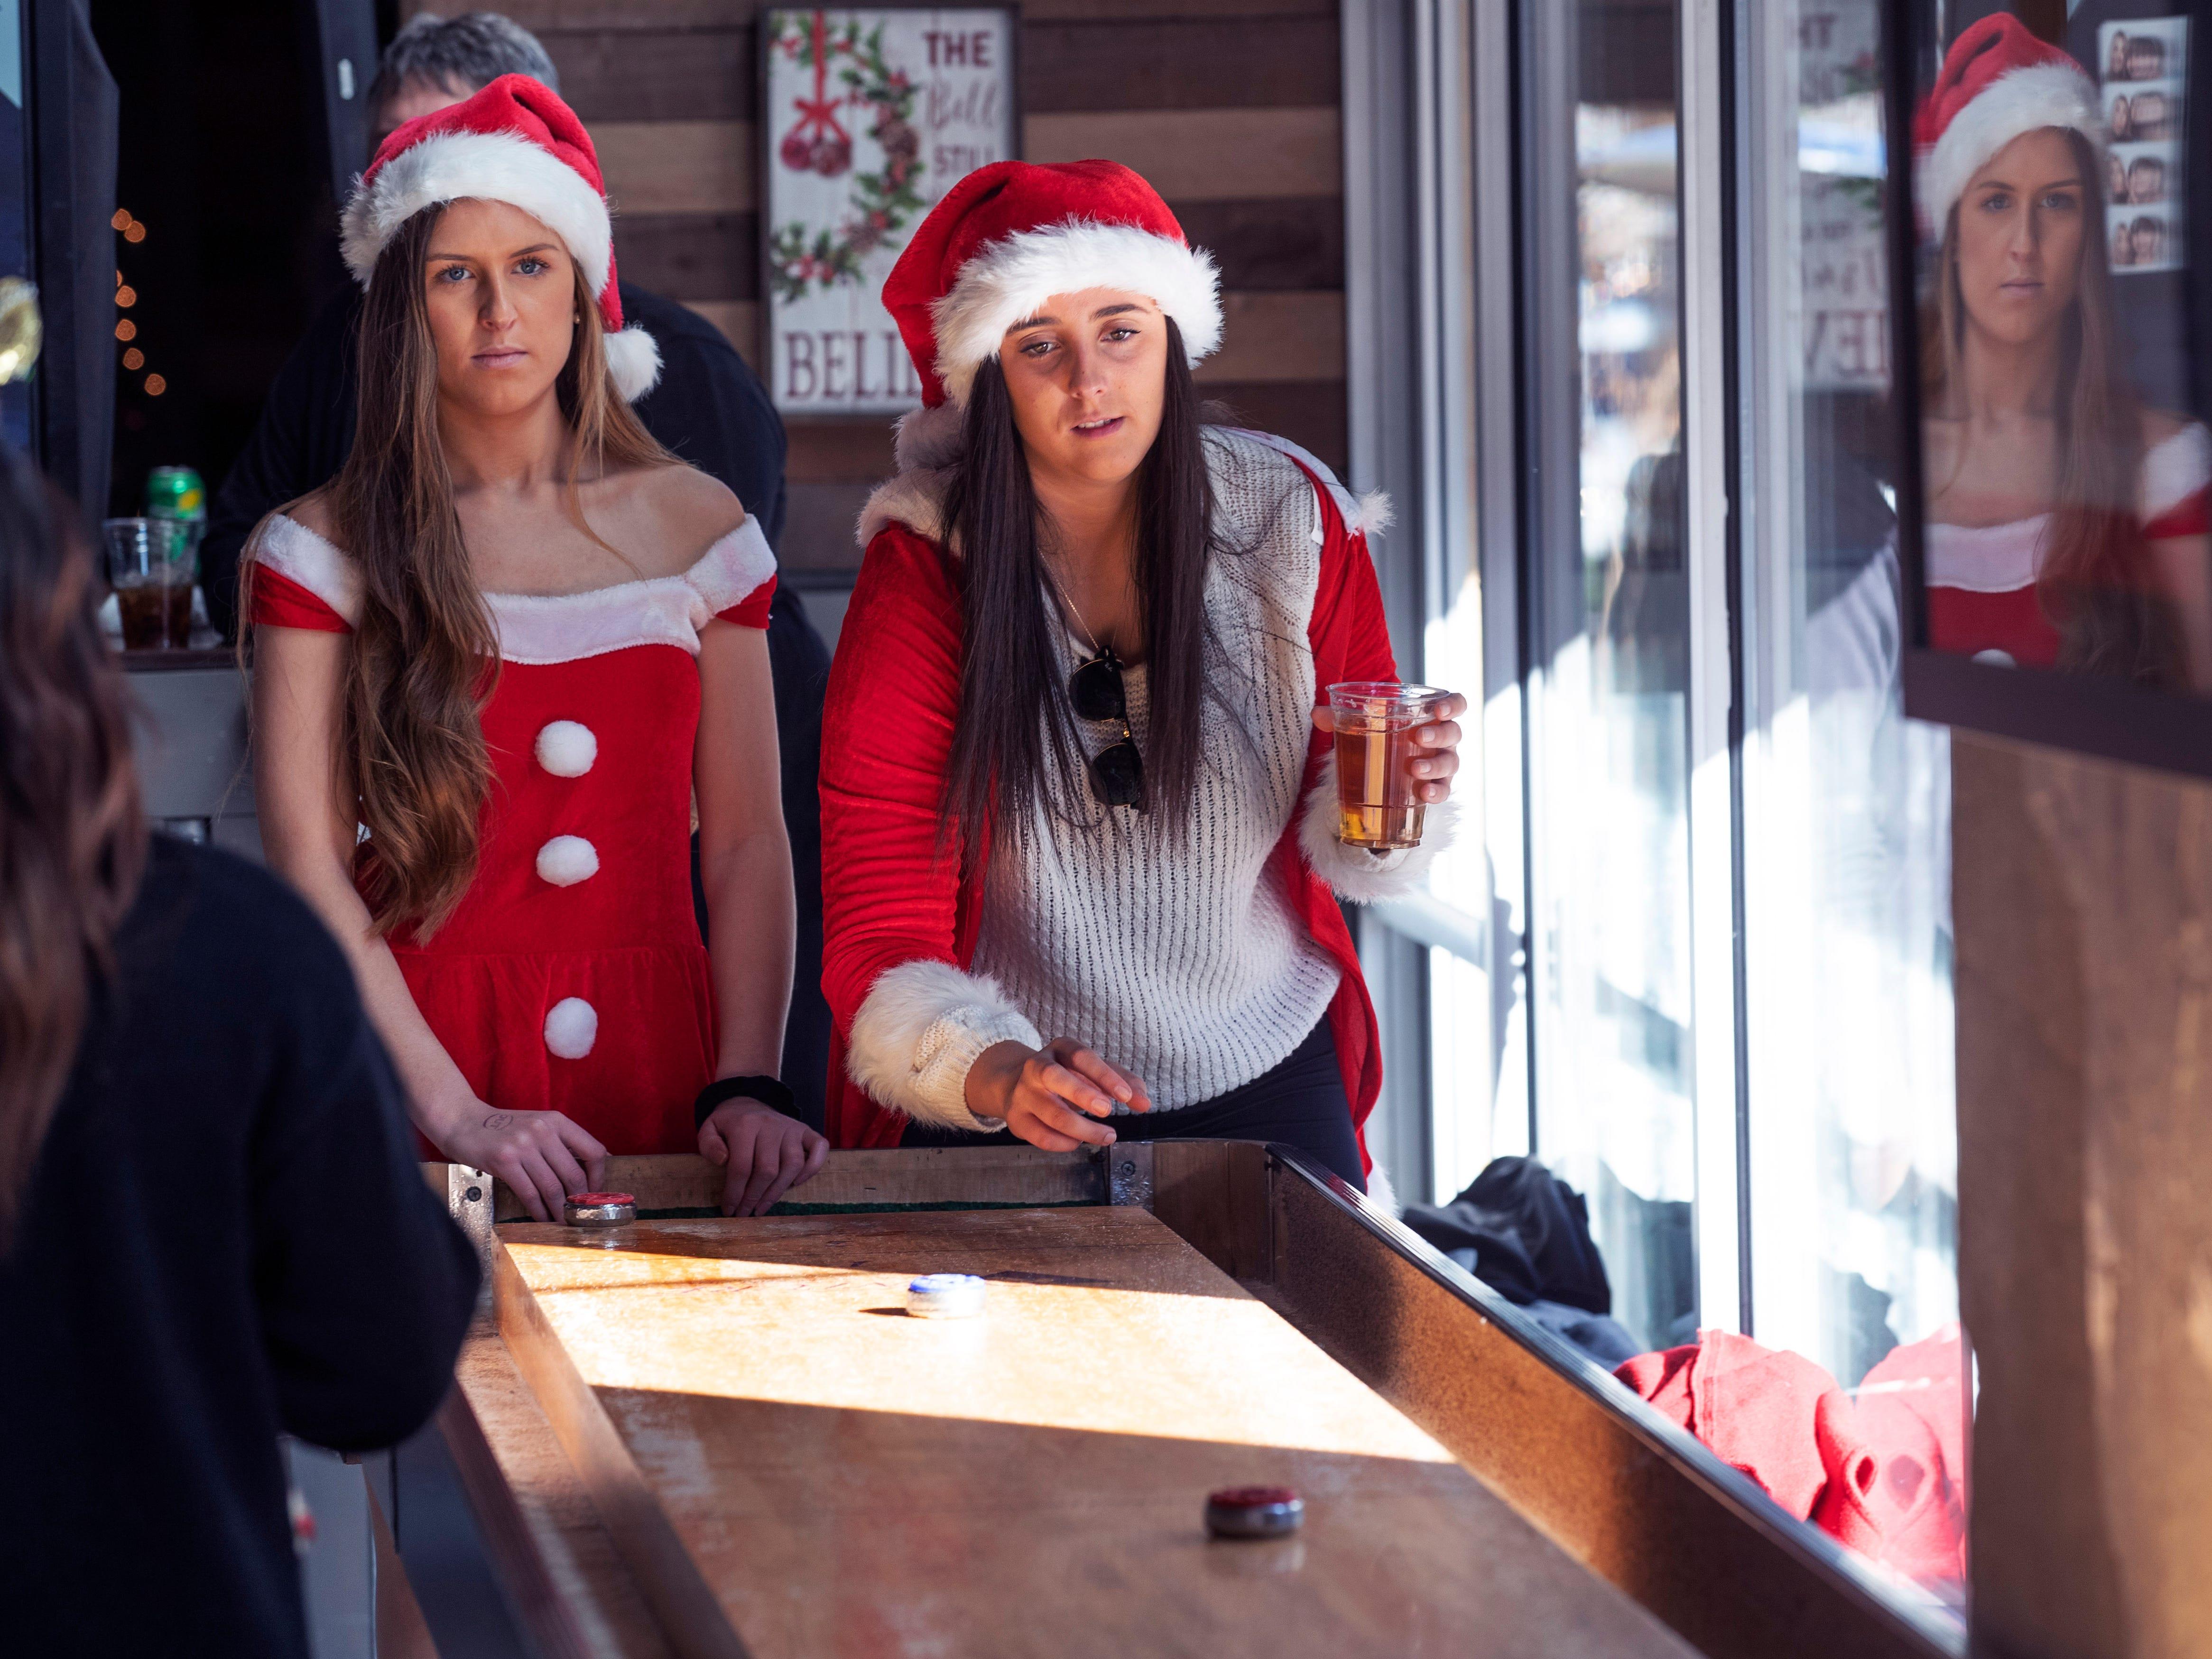 Veronica Lane and Katie Foley, both Monmouth University students enjoy the SantaCon Bar Crawl through Asbury Park on December 8, 2018 as they visit Asbury Ale House.